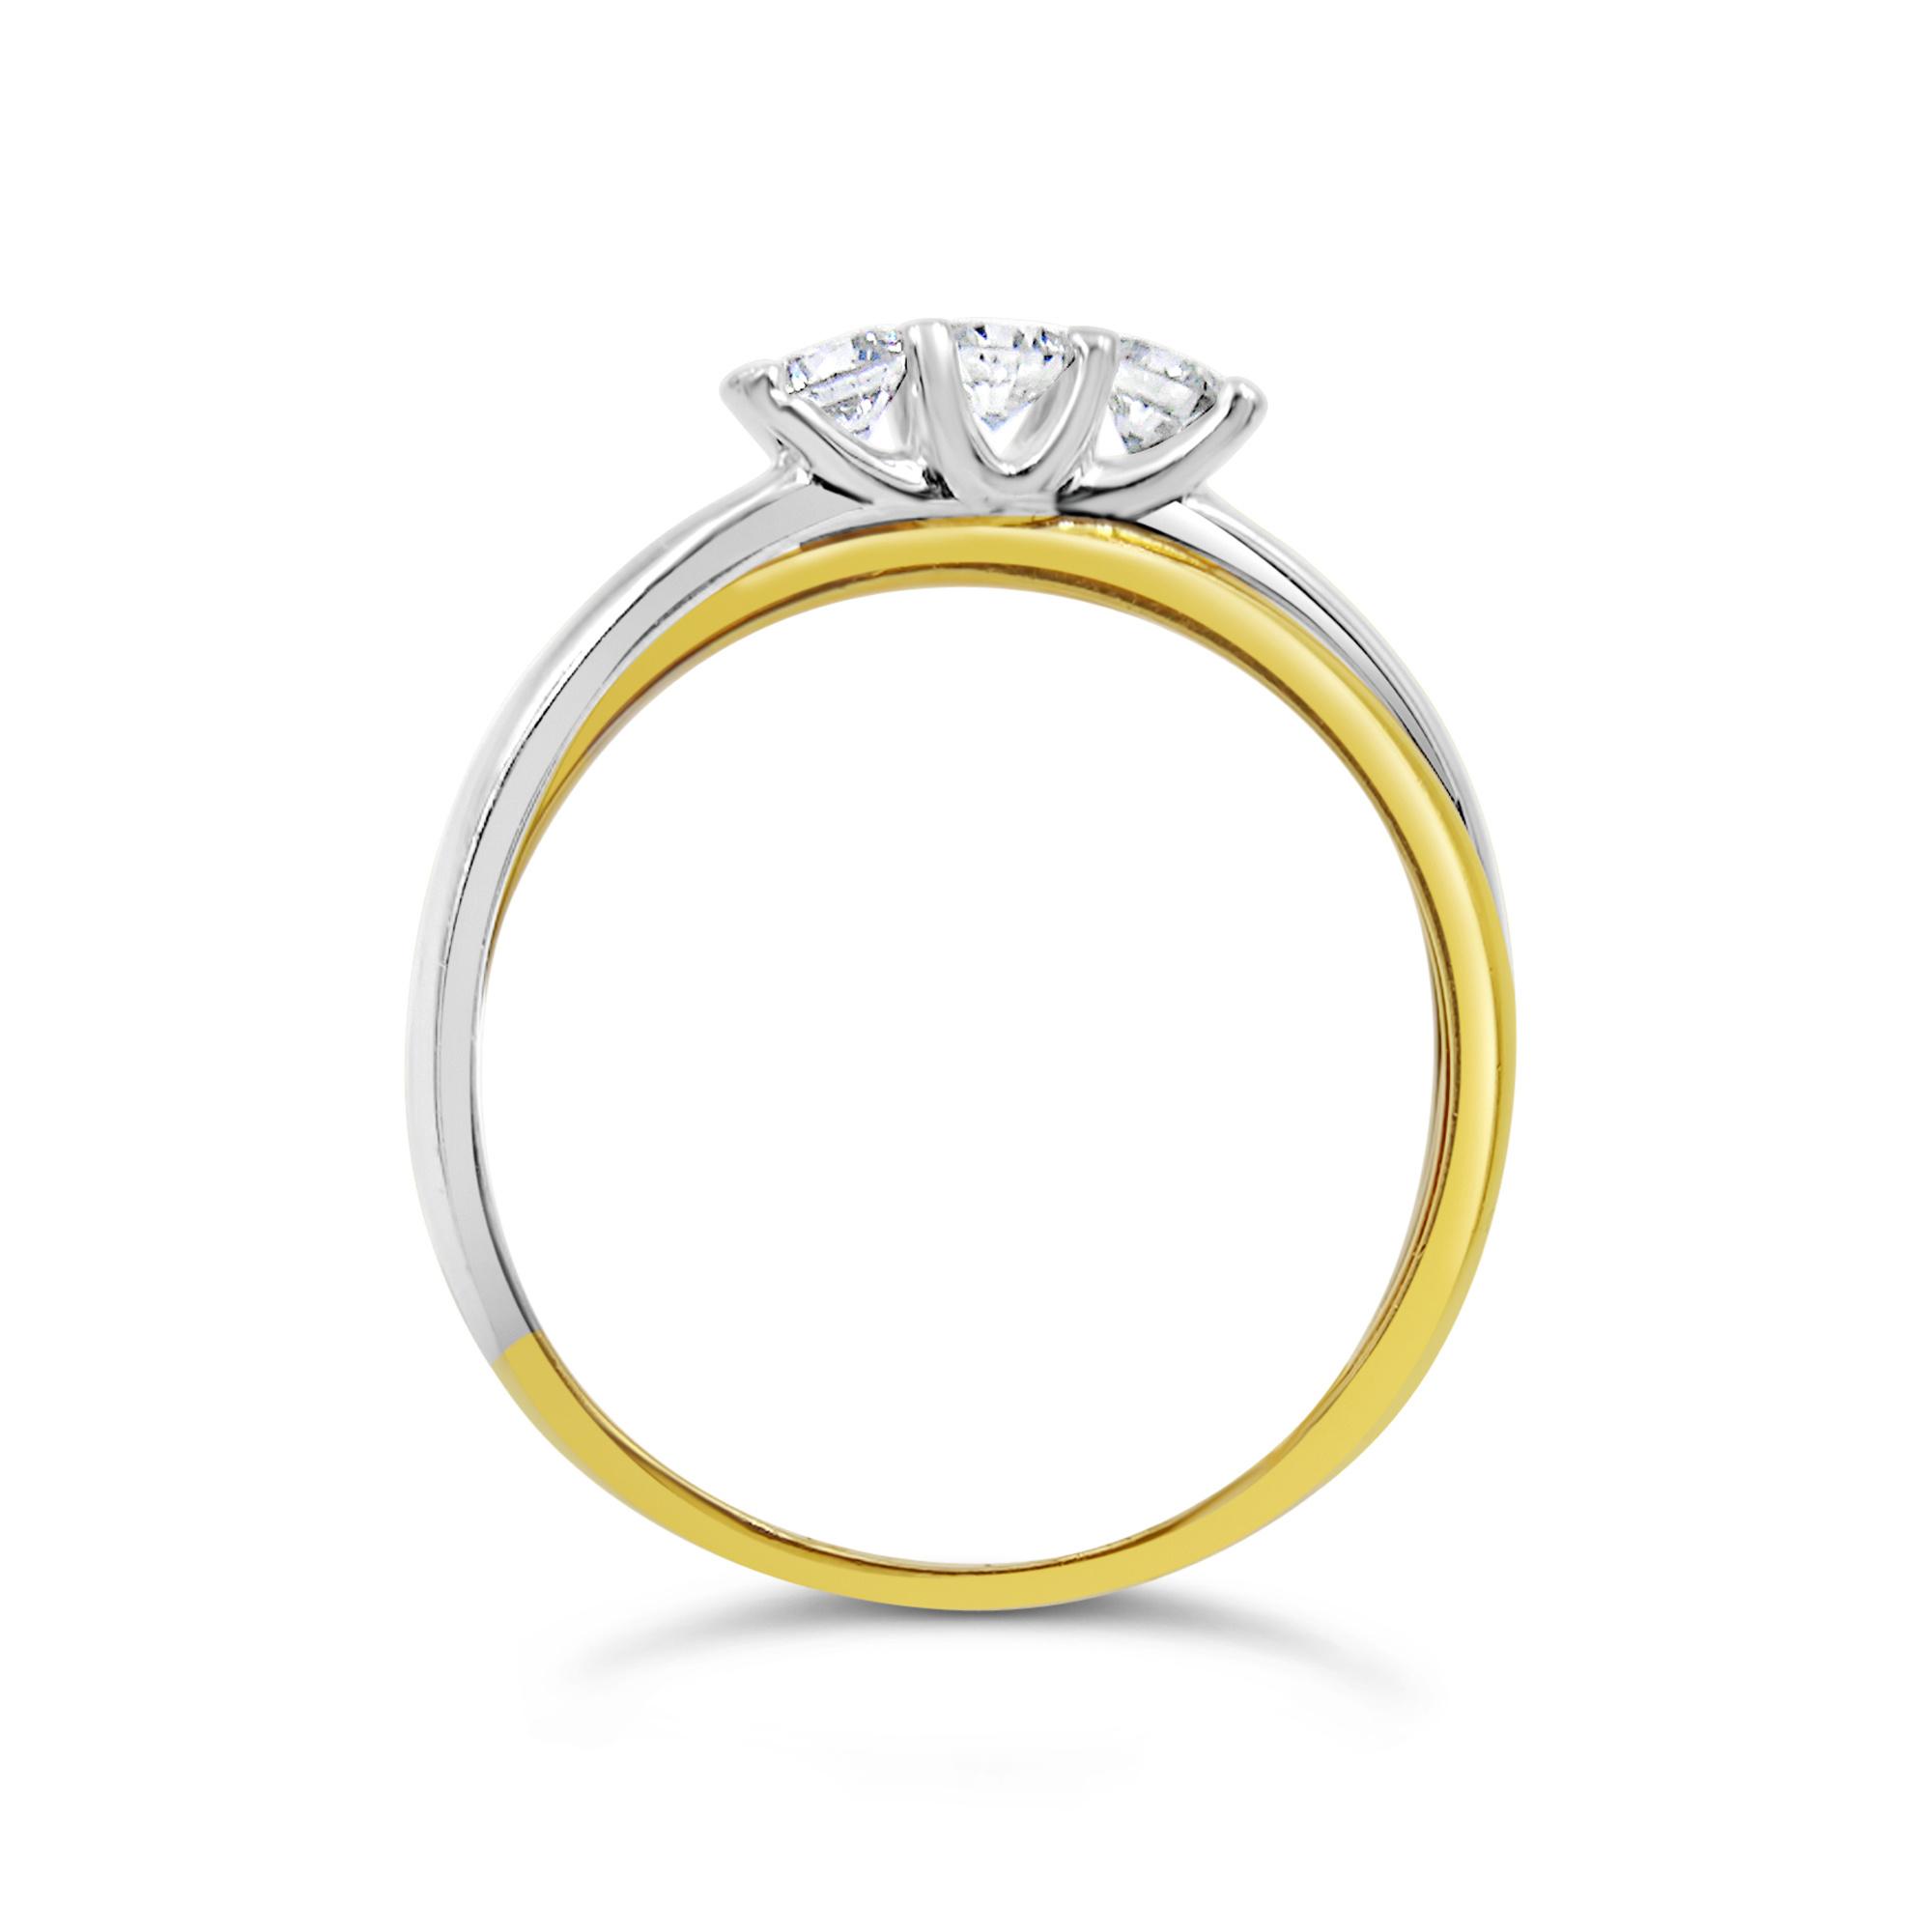 18k yellow & white gold ring with 0.31 ct diamonds